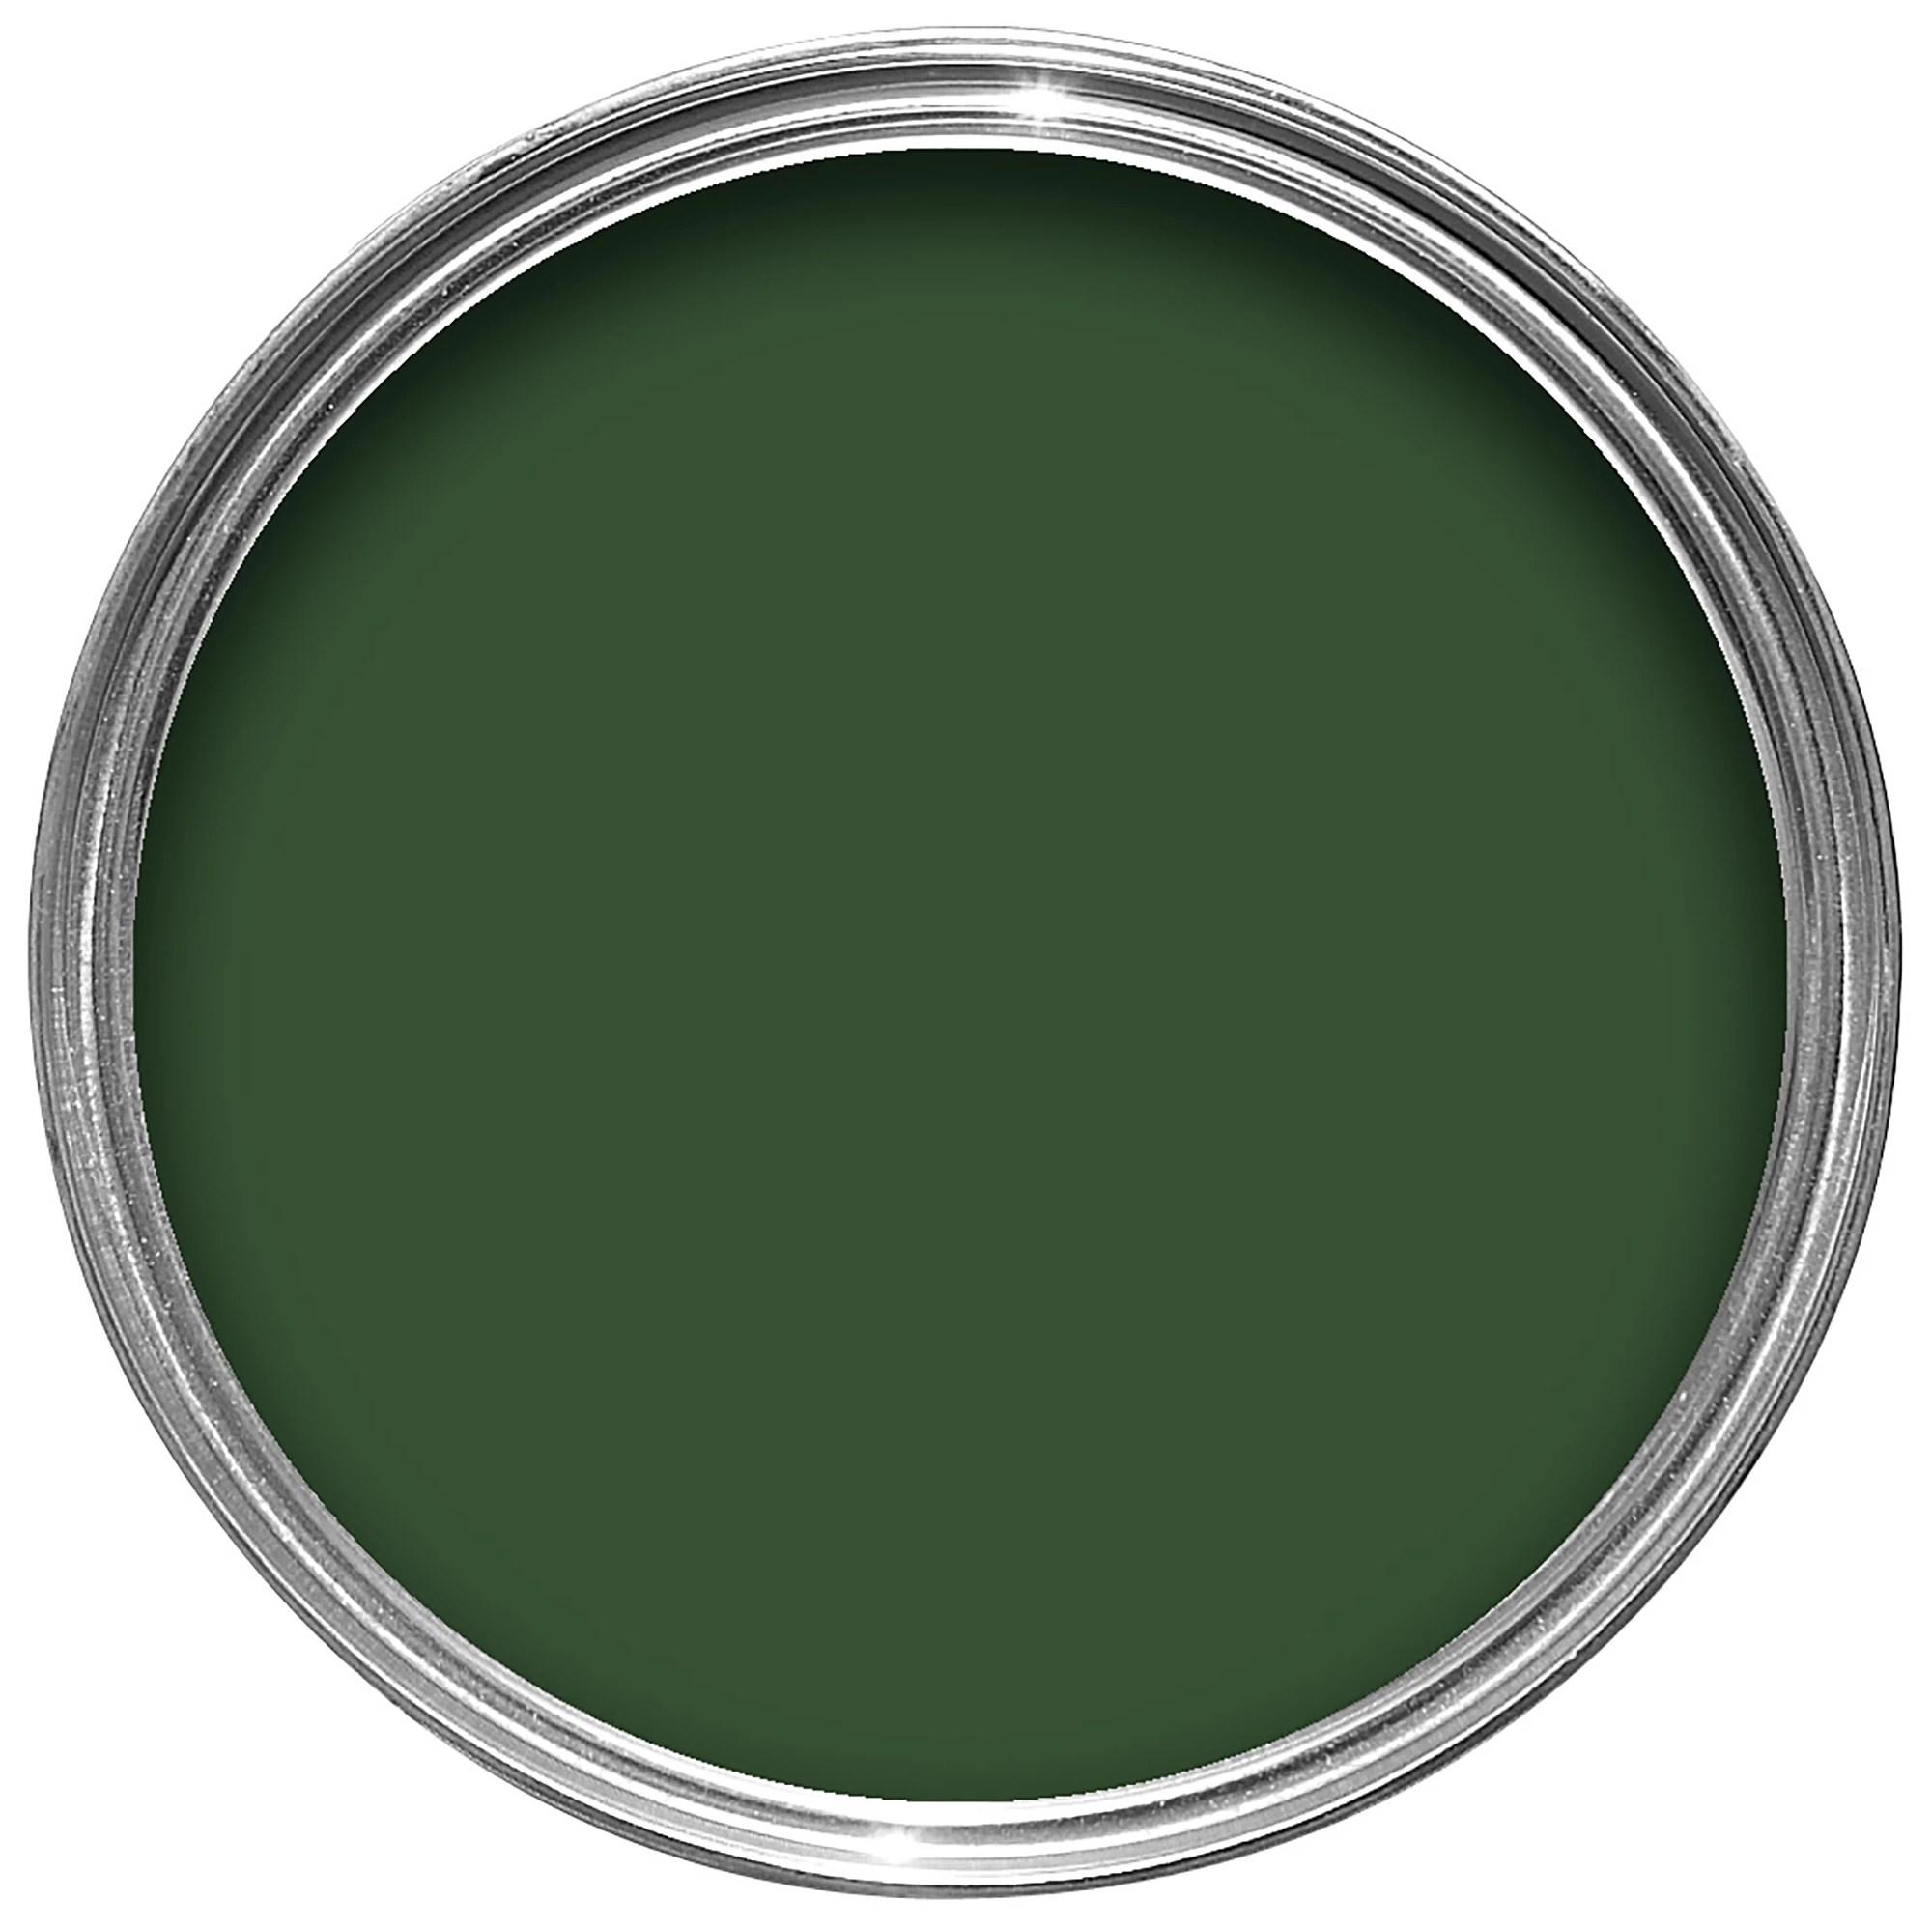 Colours Exterior Buckingham Green Gloss Wood Amp Metal Paint